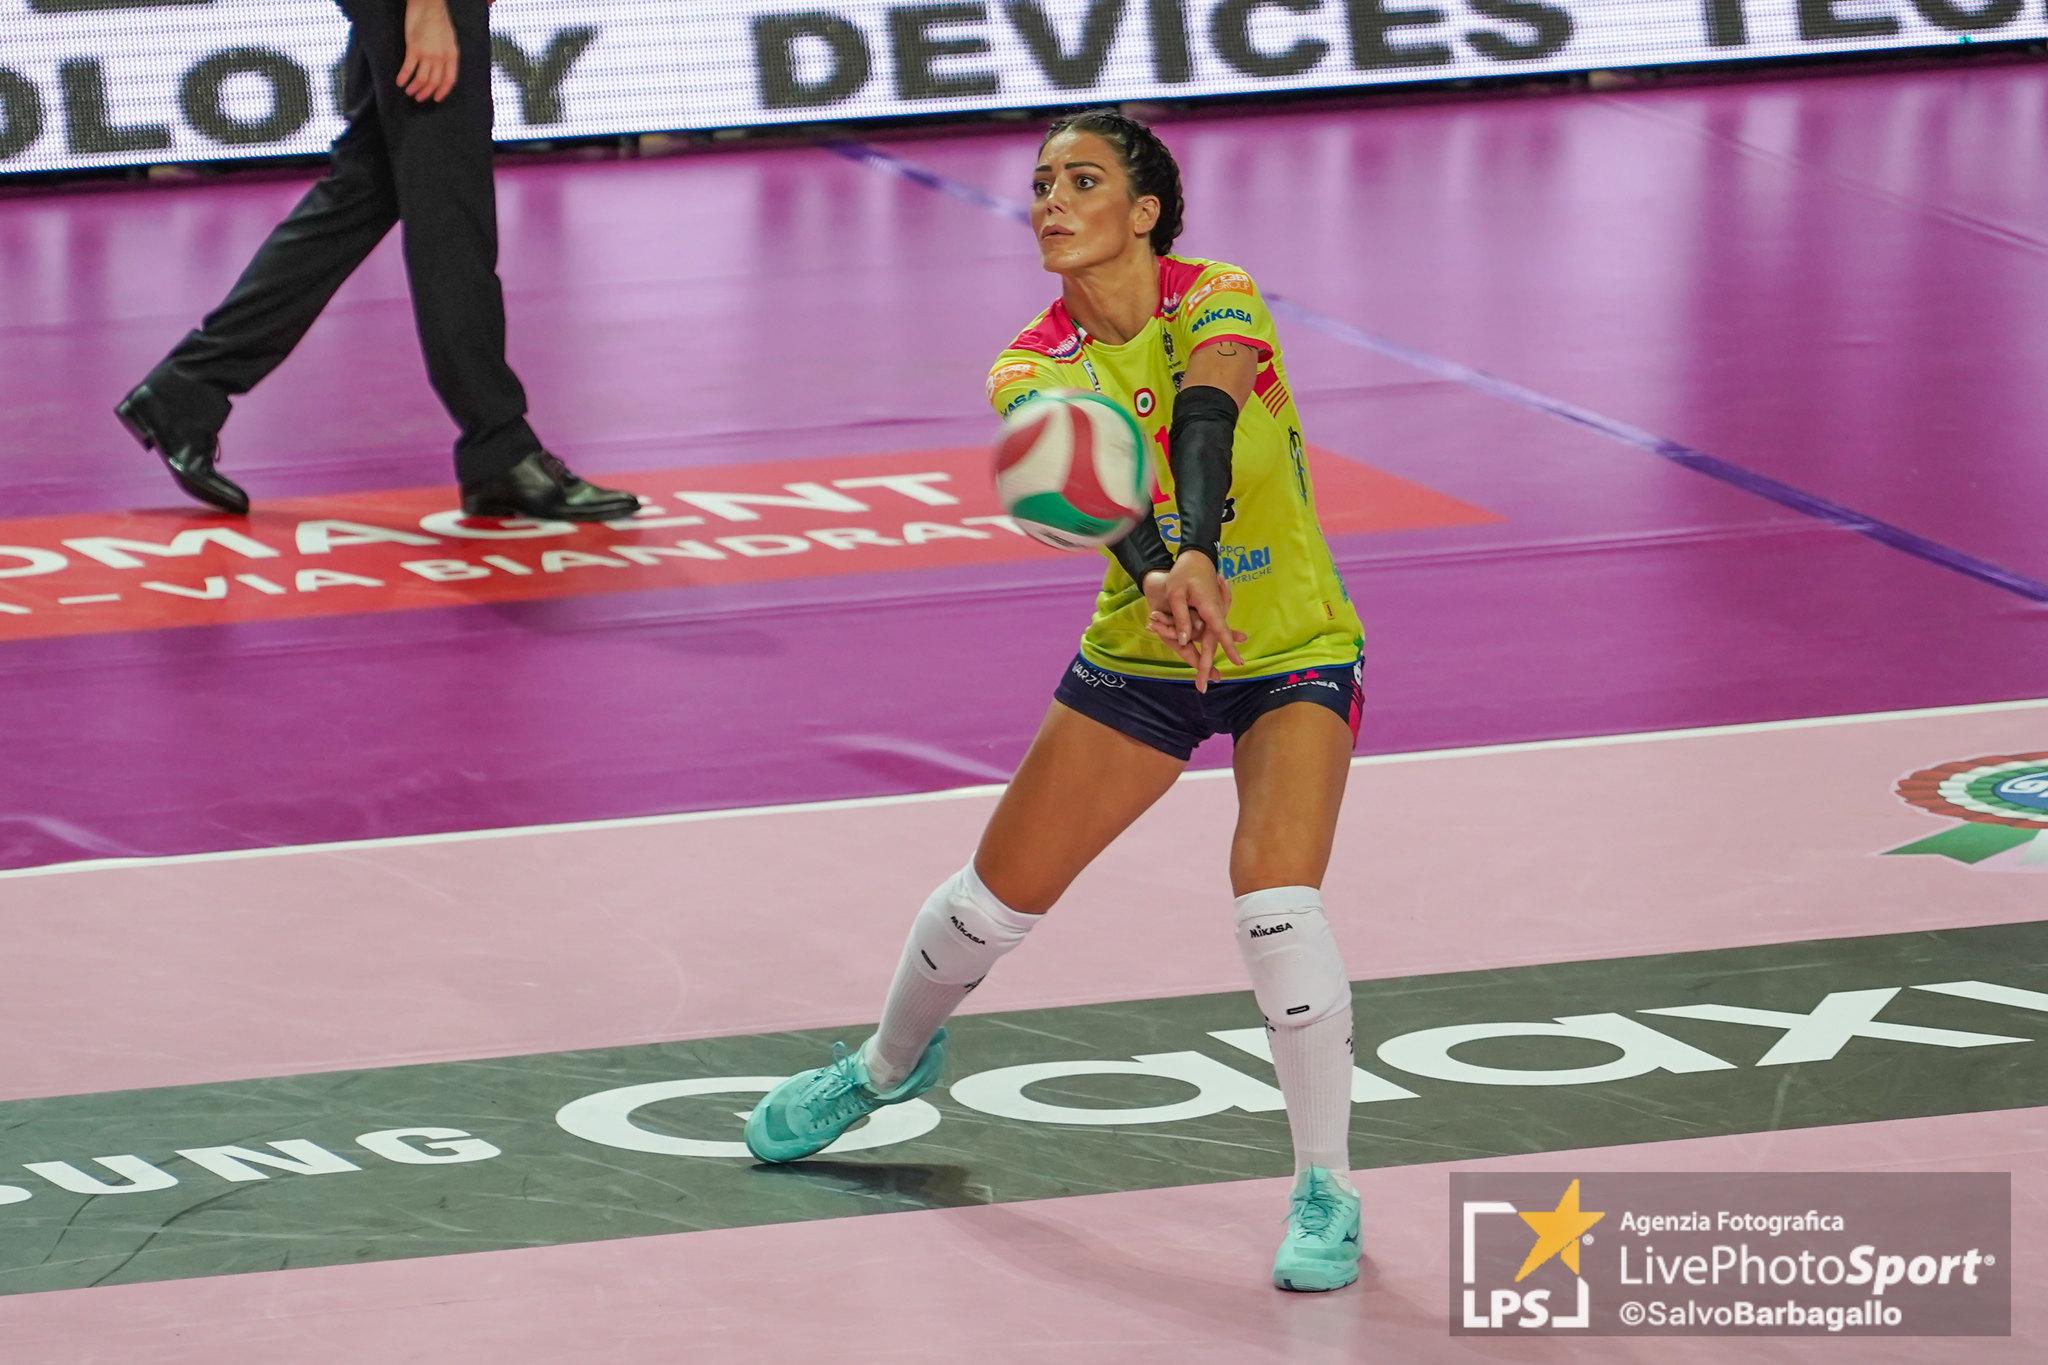 Volley Serie A1 Femminile 2018/2019 - Igor Gorgonzola Novara vs Banca Valsabbina Millenium Brescia